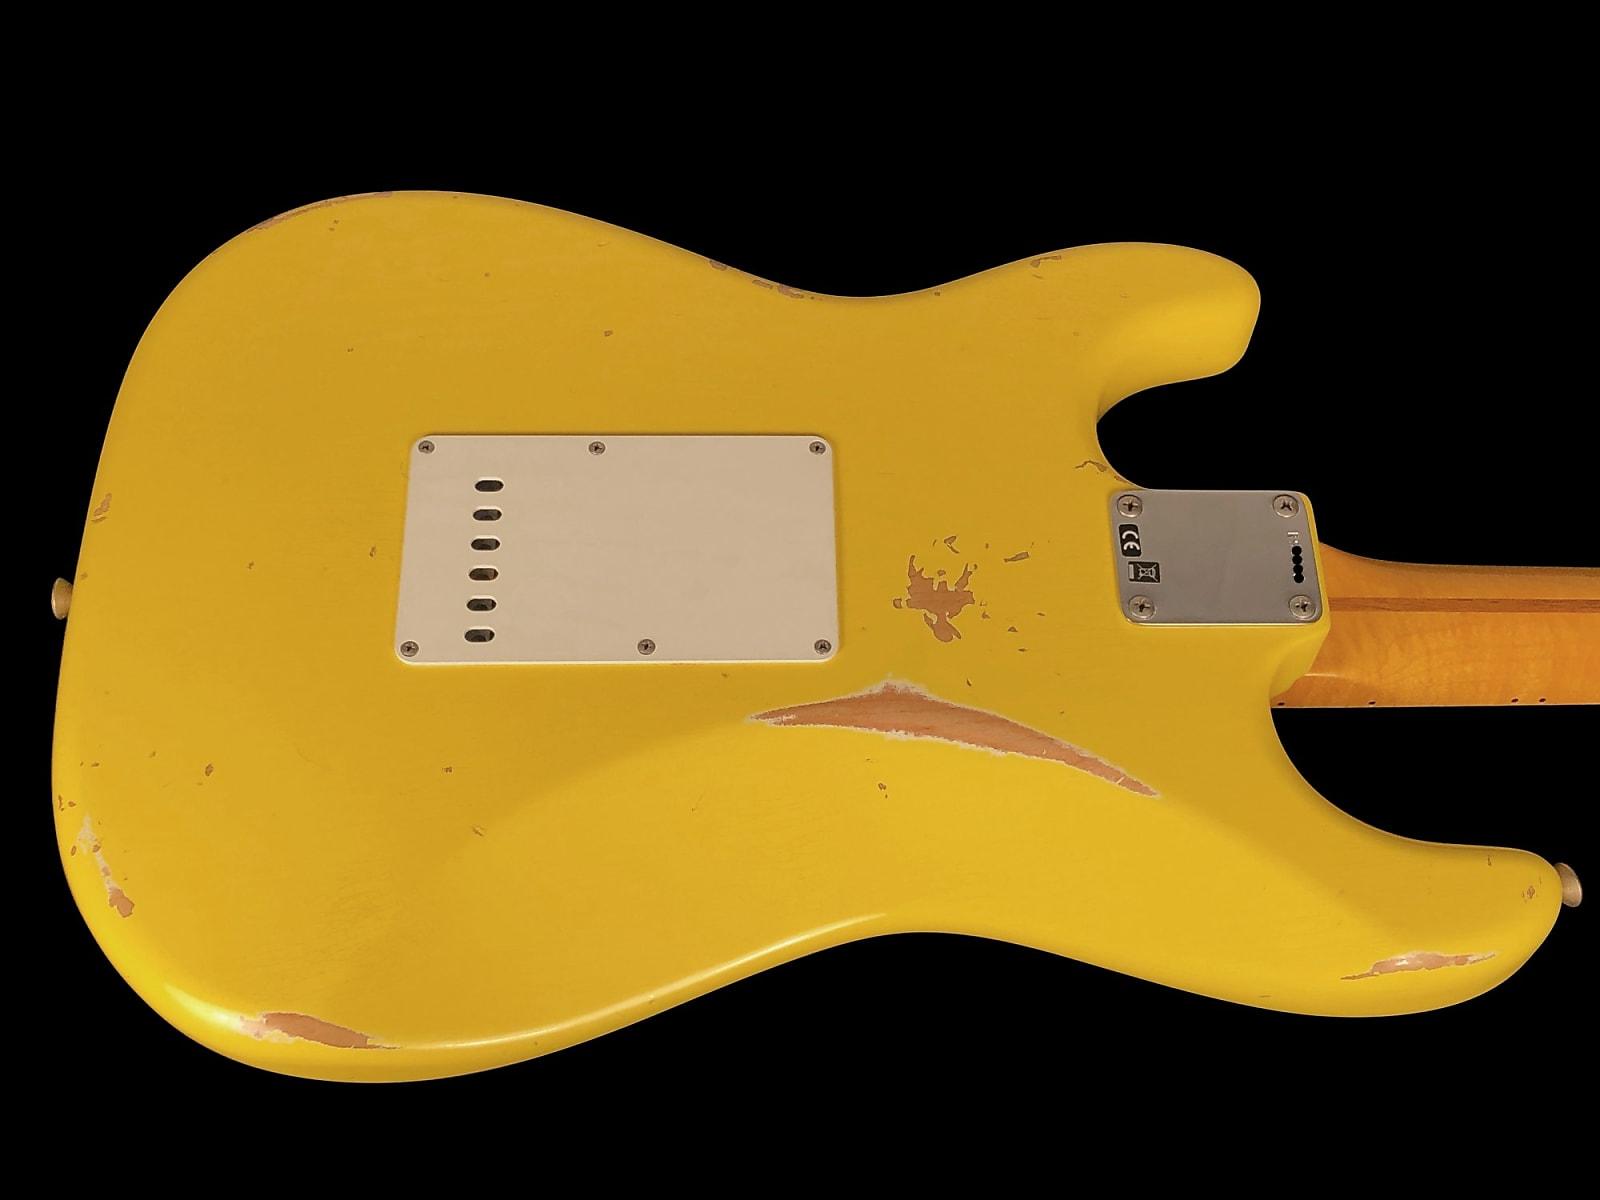 2017 Fender Stratocaster 1957 Custom Shop '57 Heavy Relic Strat ~ Graffiti Yellow